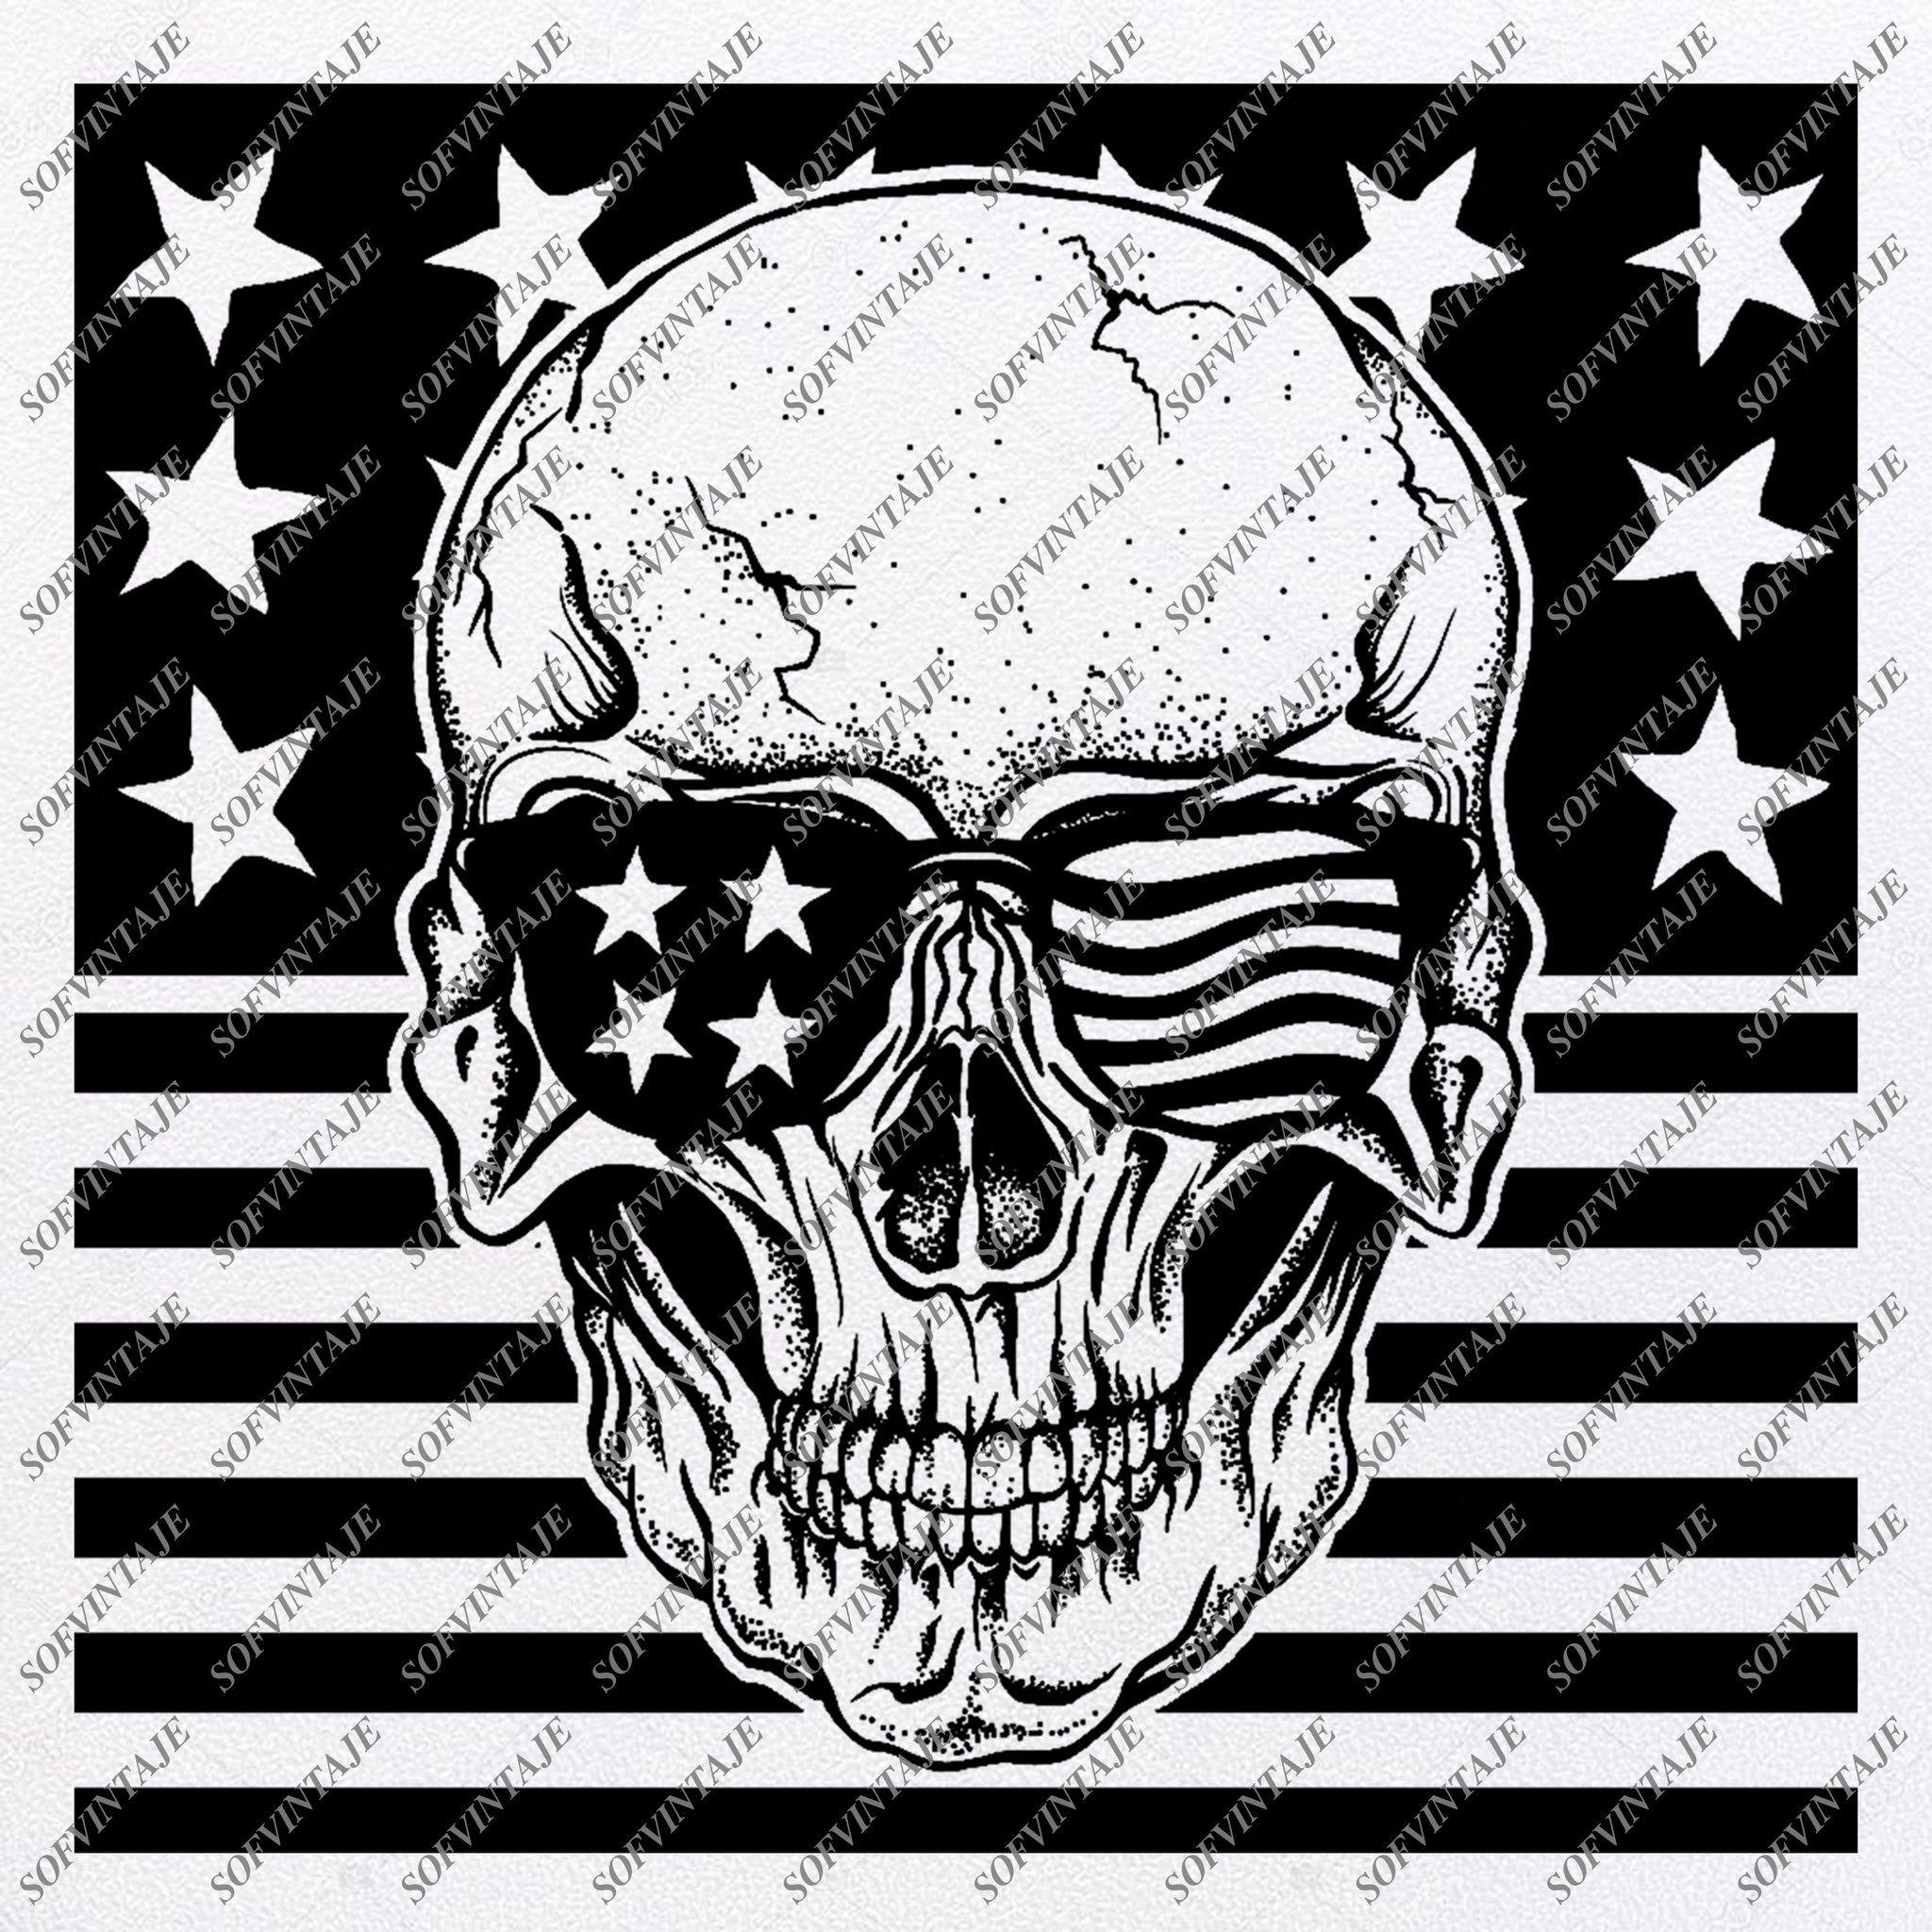 Unique Distressed American Flag Silhouette Design » Free Vector Art,  Images, Graphics & Clipart